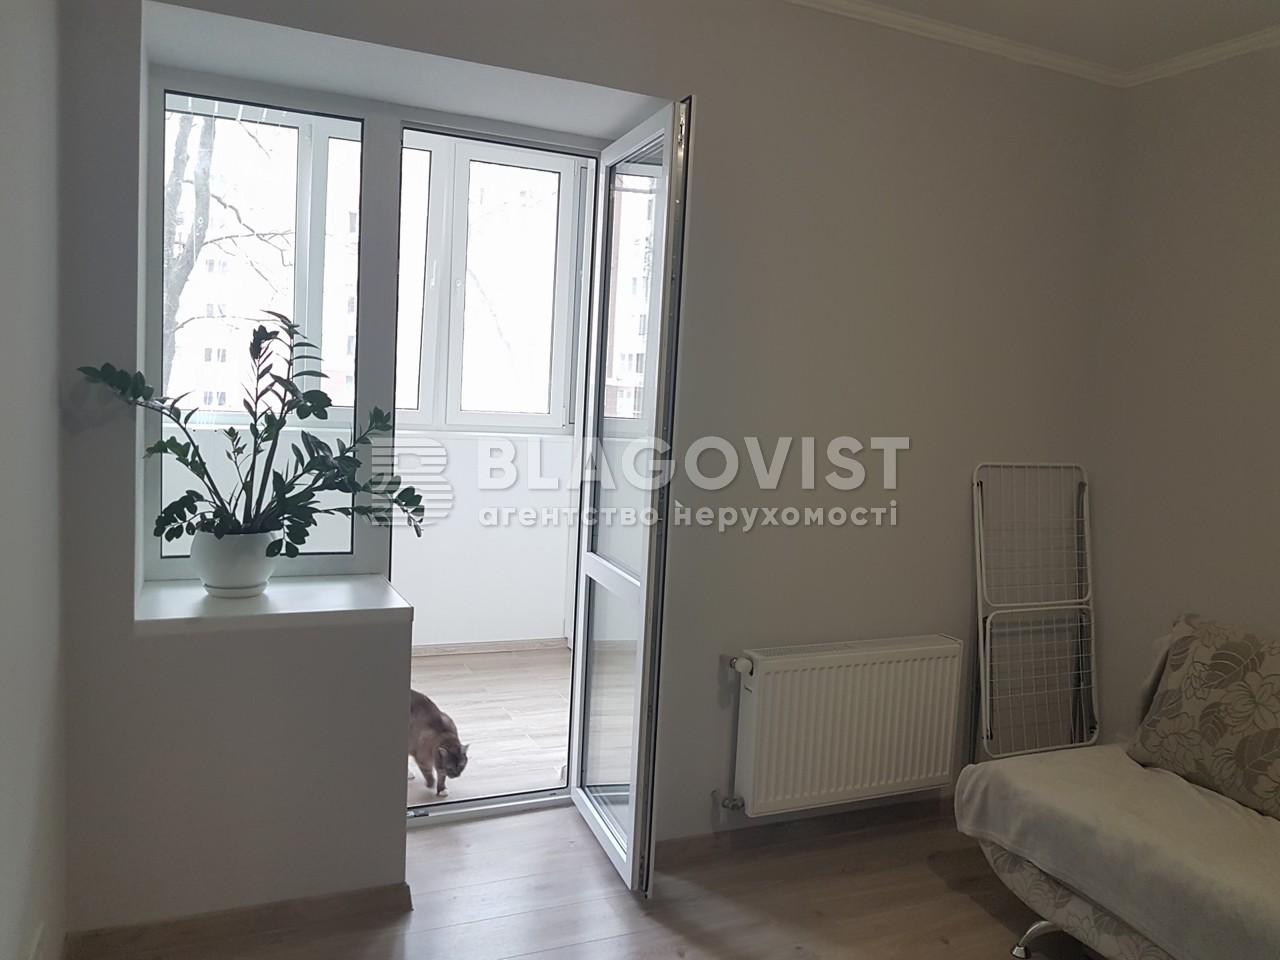 Квартира E-40784, Леси Украинки, 4, Софиевская Борщаговка - Фото 11